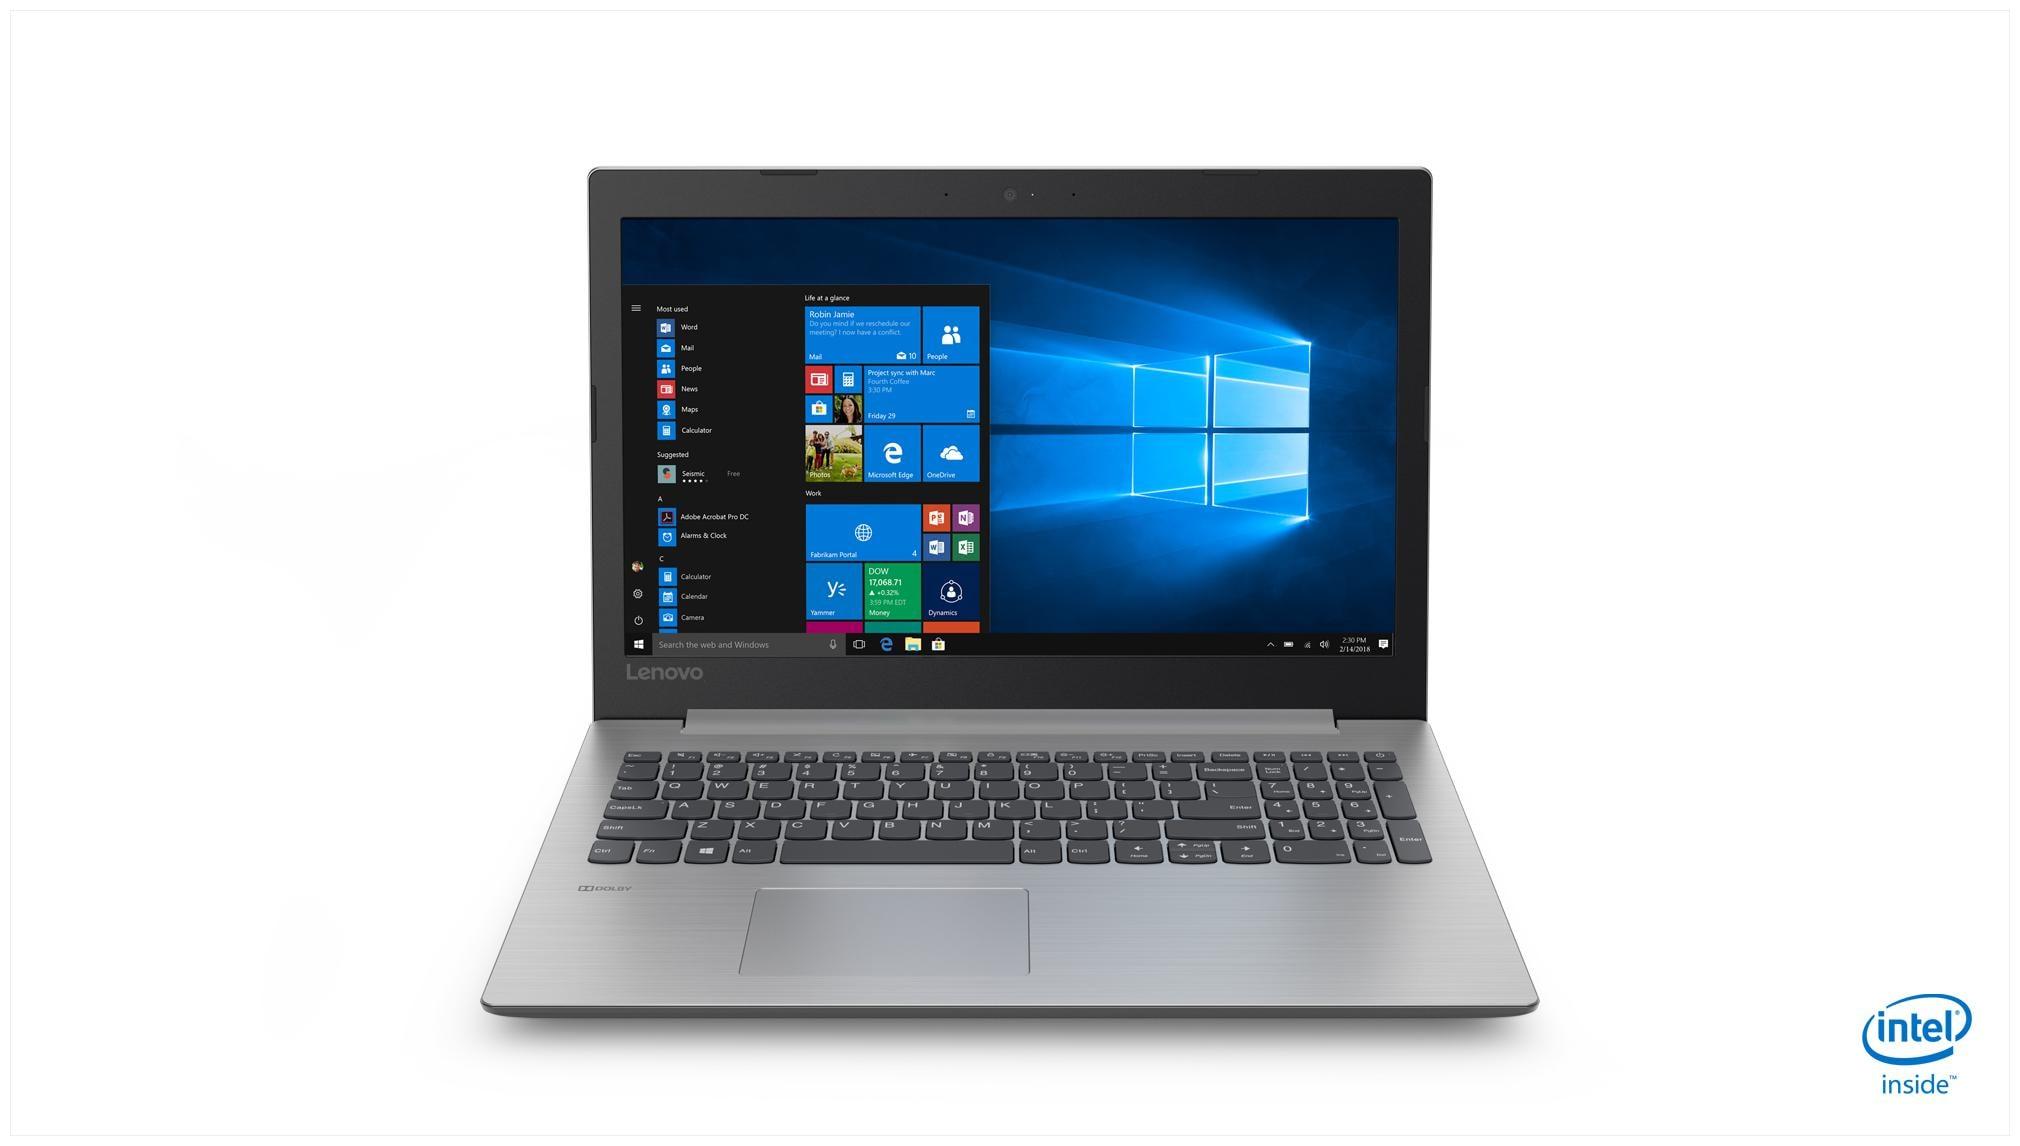 Lenovo Ideapad 330  Core i5   8th Gen / 8  GB RAM / 2 TB HDD / 39.62 cm  15.6 Inch  / Windows 10 / 2  GB Graphics  81DE012PIN  Platinum Grey , 2.2 Kg